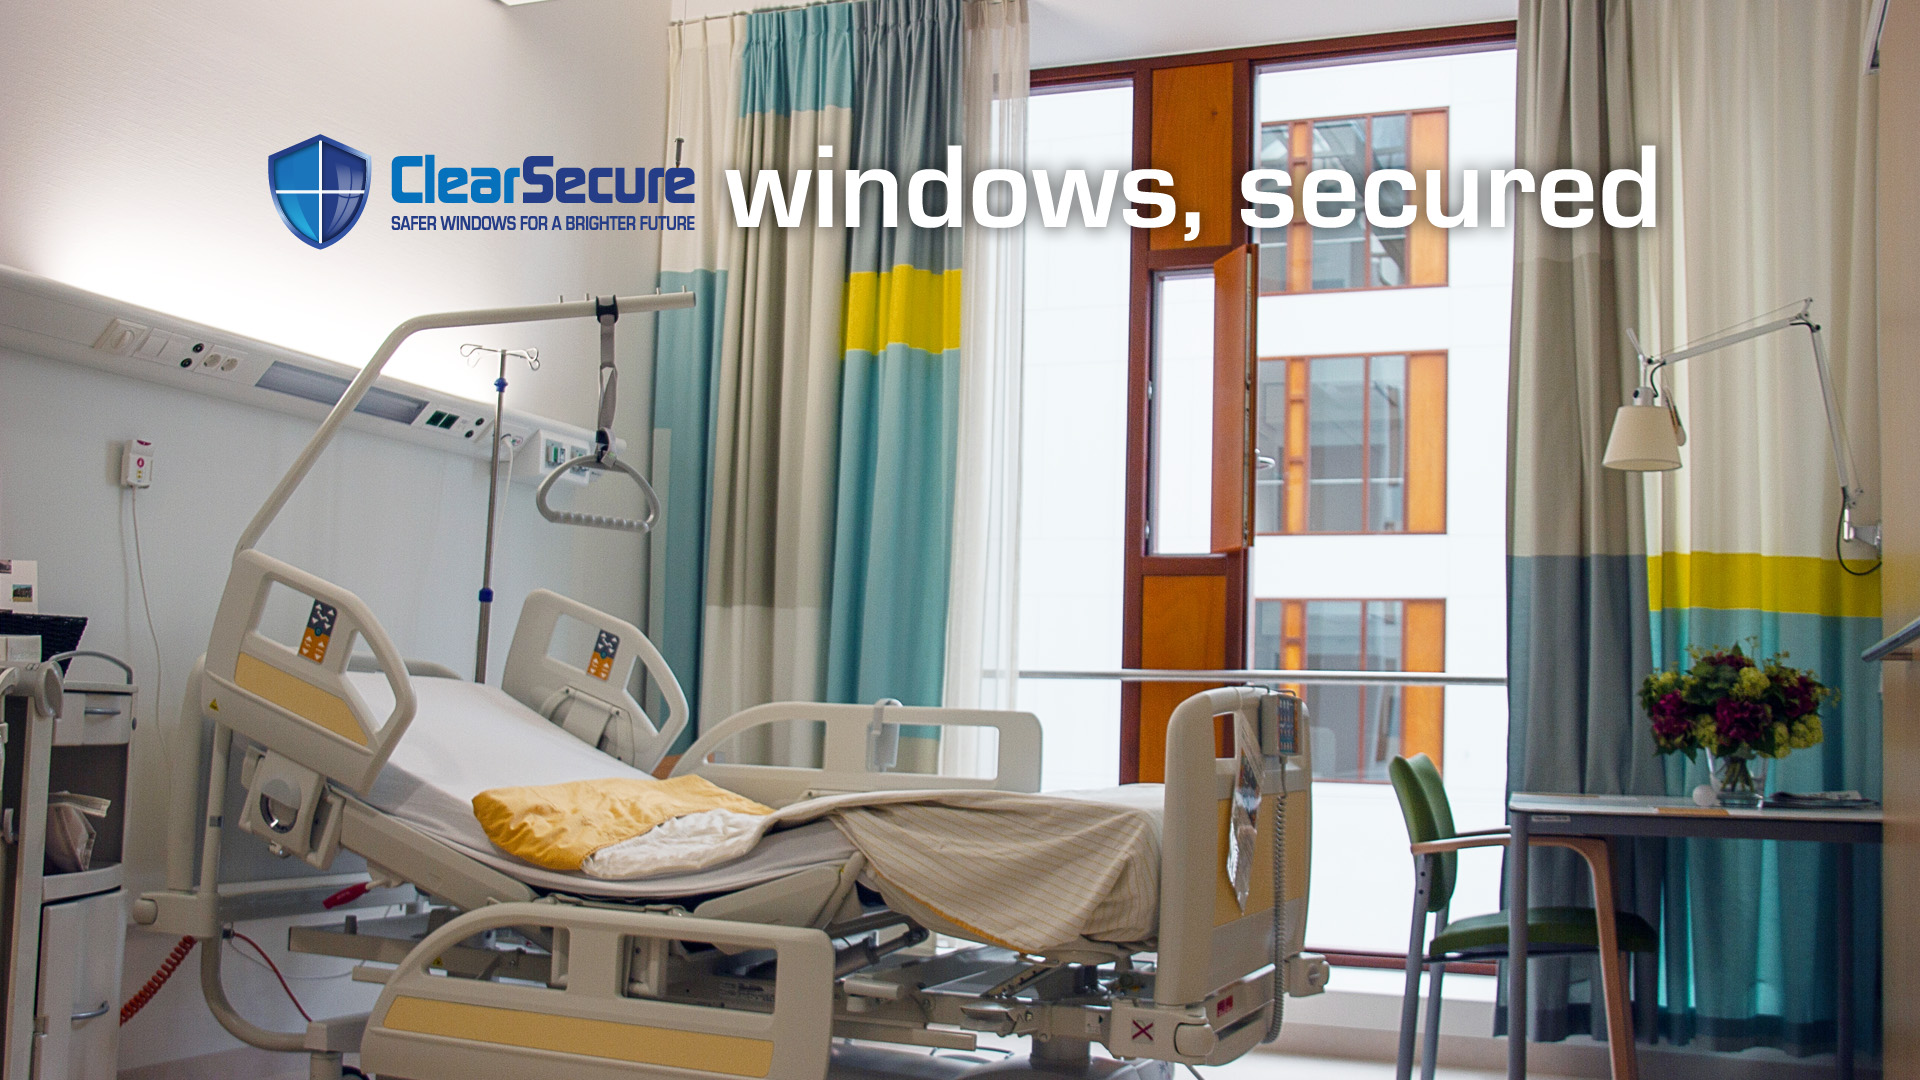 ClearSecureBanners-HiDef_2019-02-03a_windows-secured.jpg